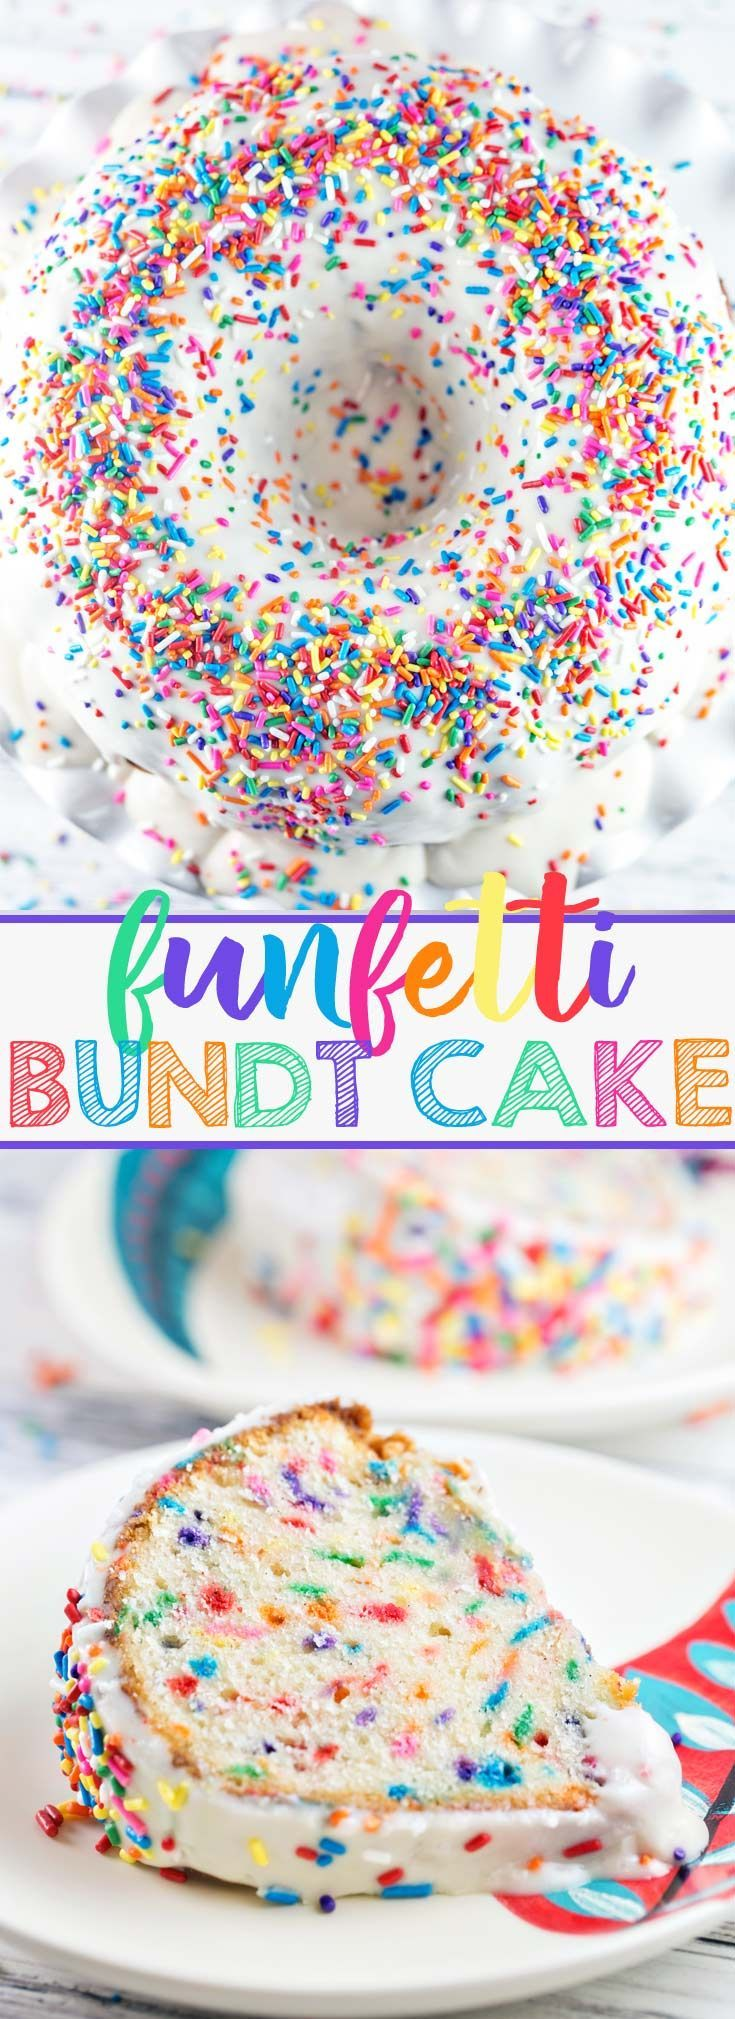 Funfetti Bundt Cake: Get ready to celebrate with t…